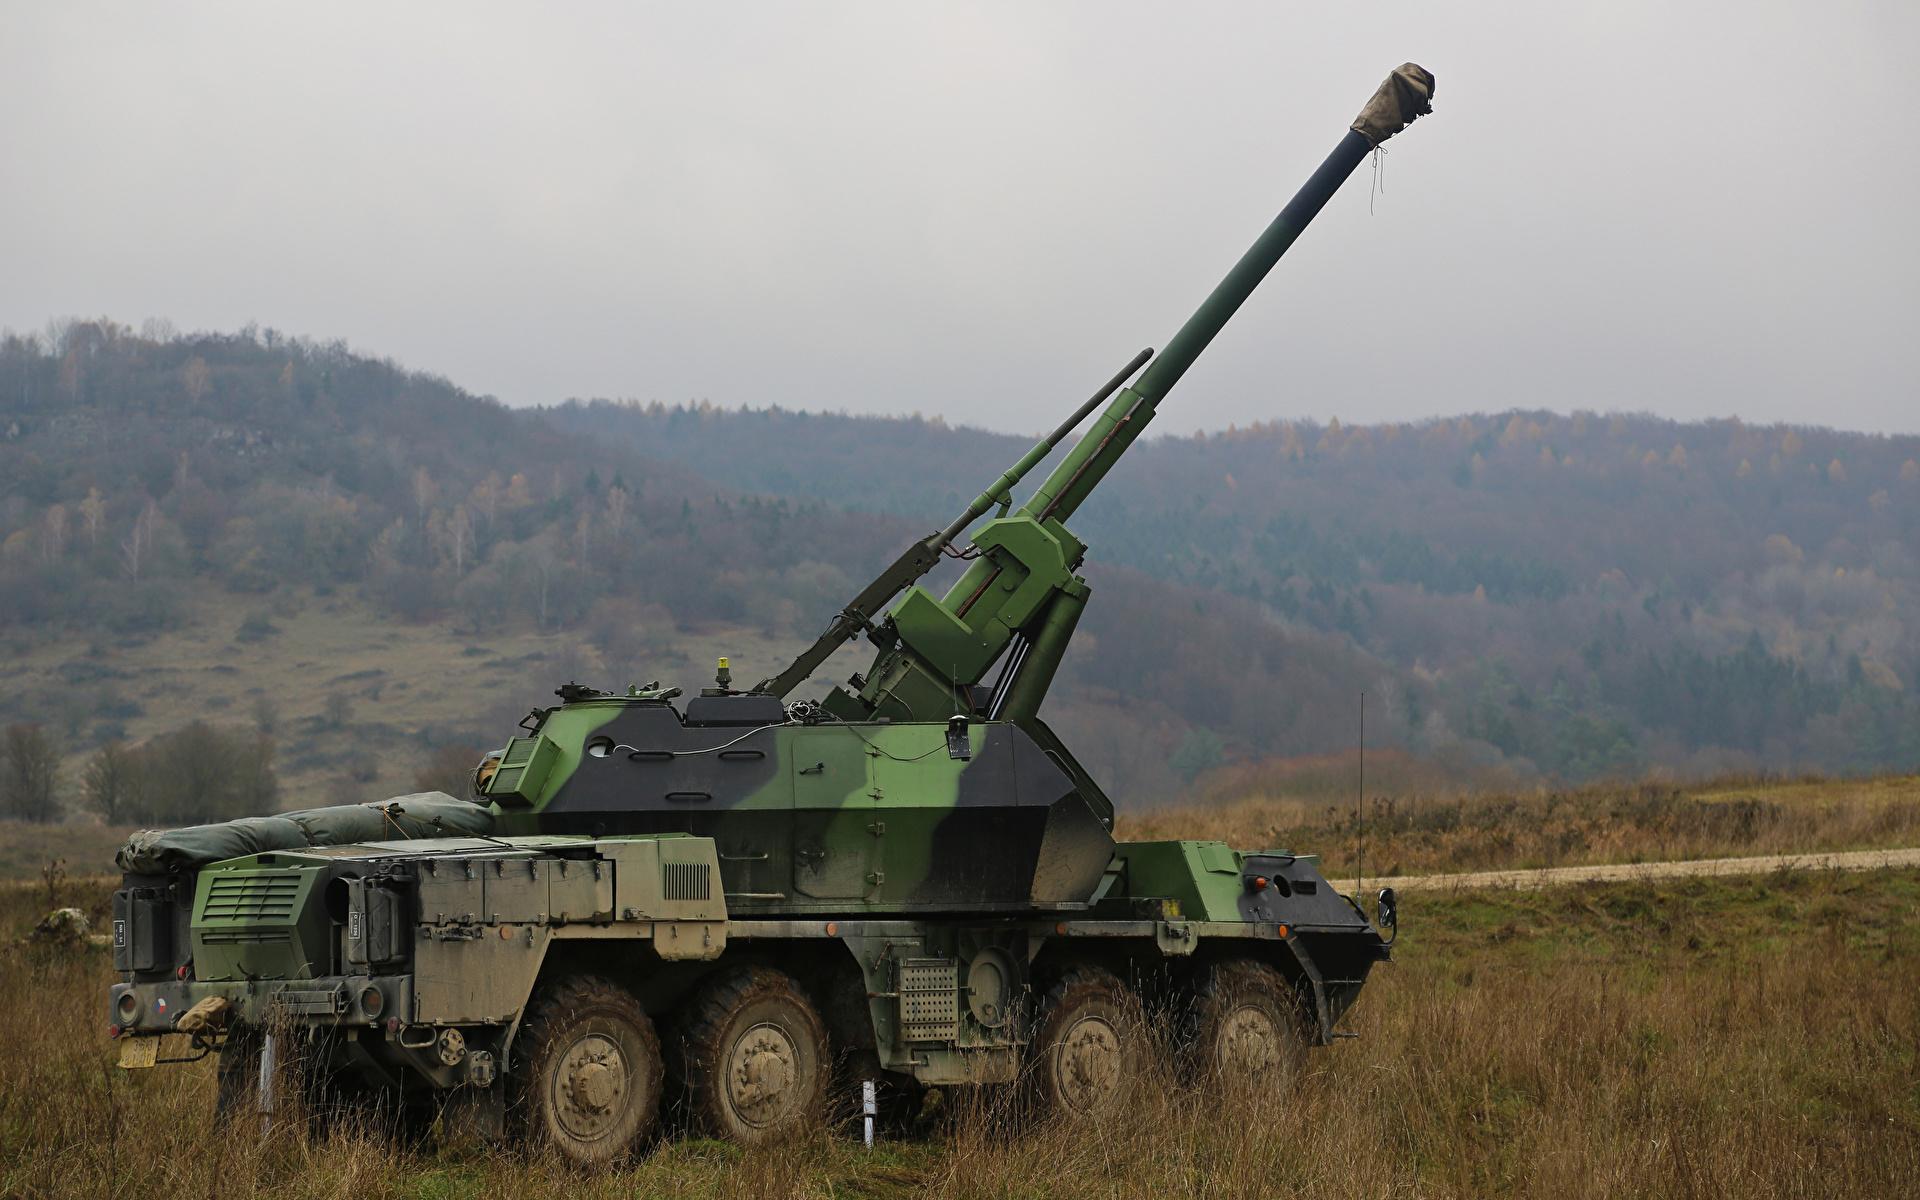 1920x1200、カノン砲、自走砲、1979-89 DANA ShKH vz.77、、陸軍、